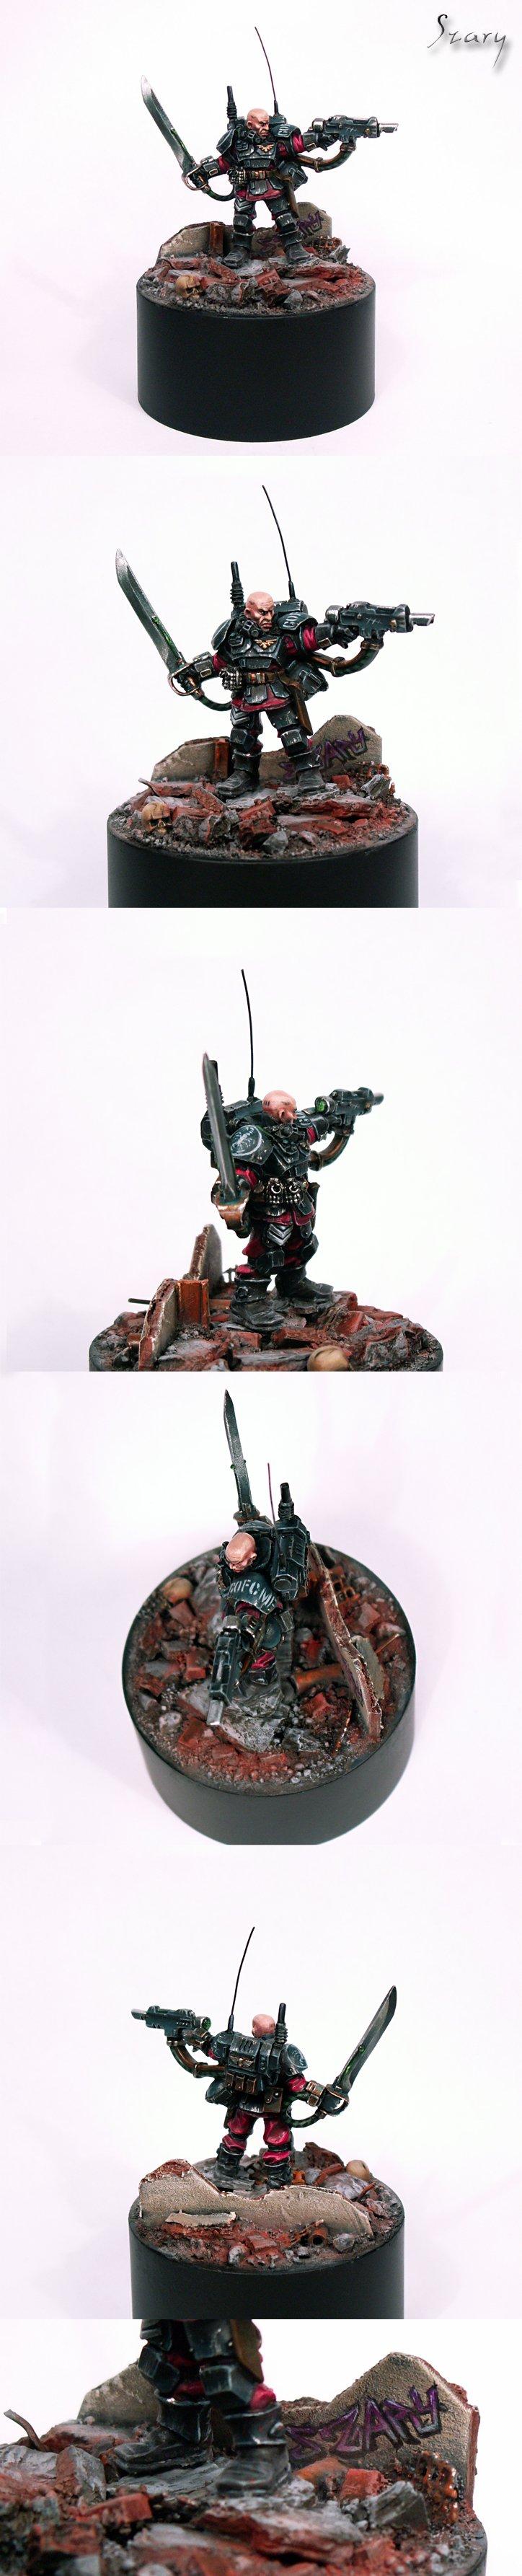 Karskin sergeant